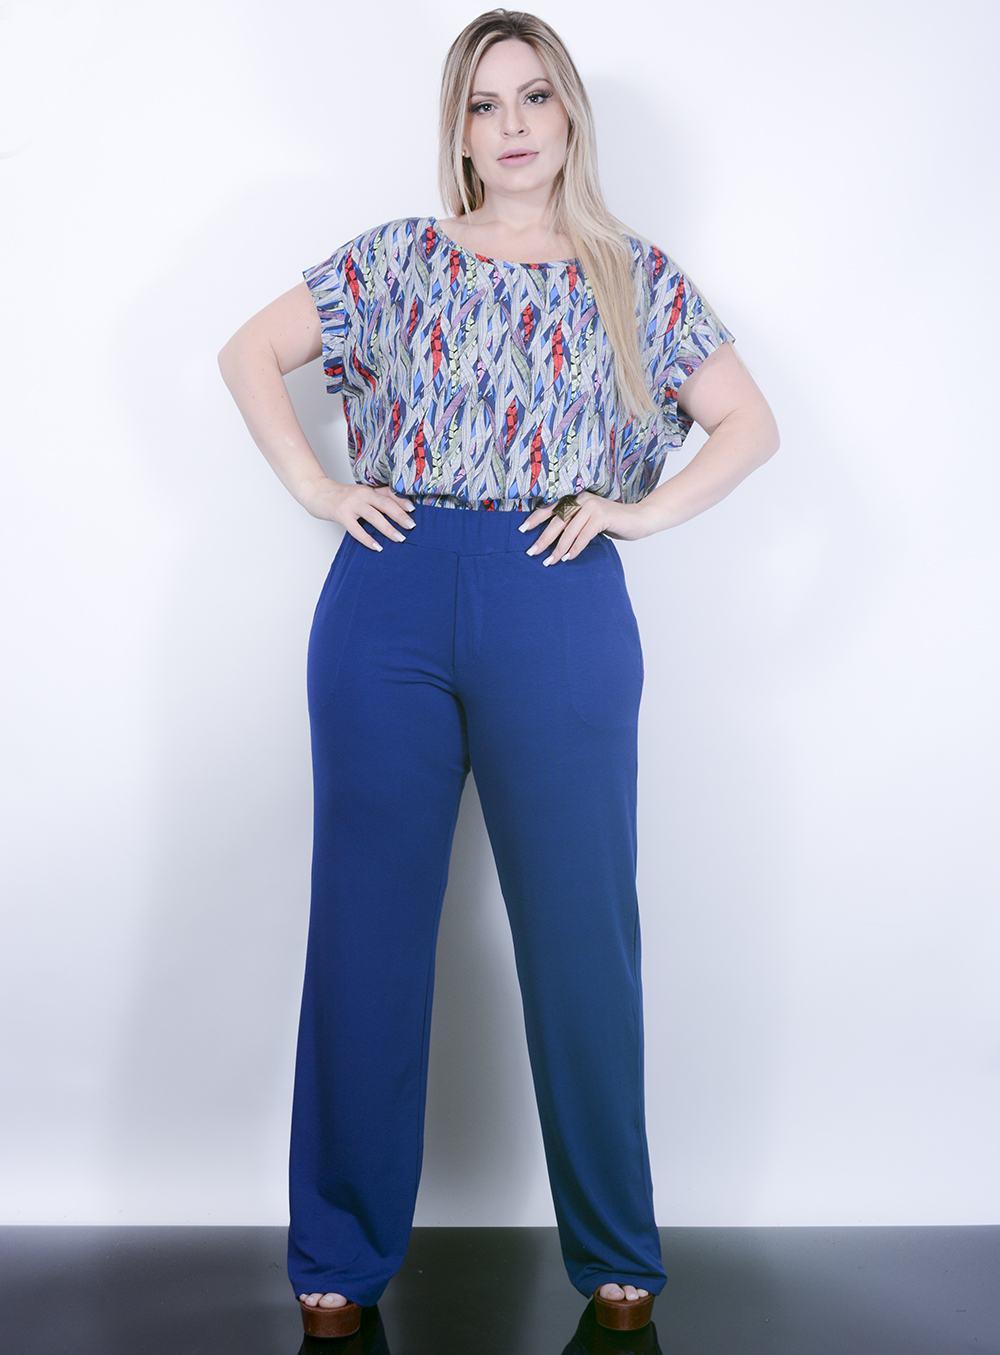 807146b9a7 Calça Pantalona Plus Size Online